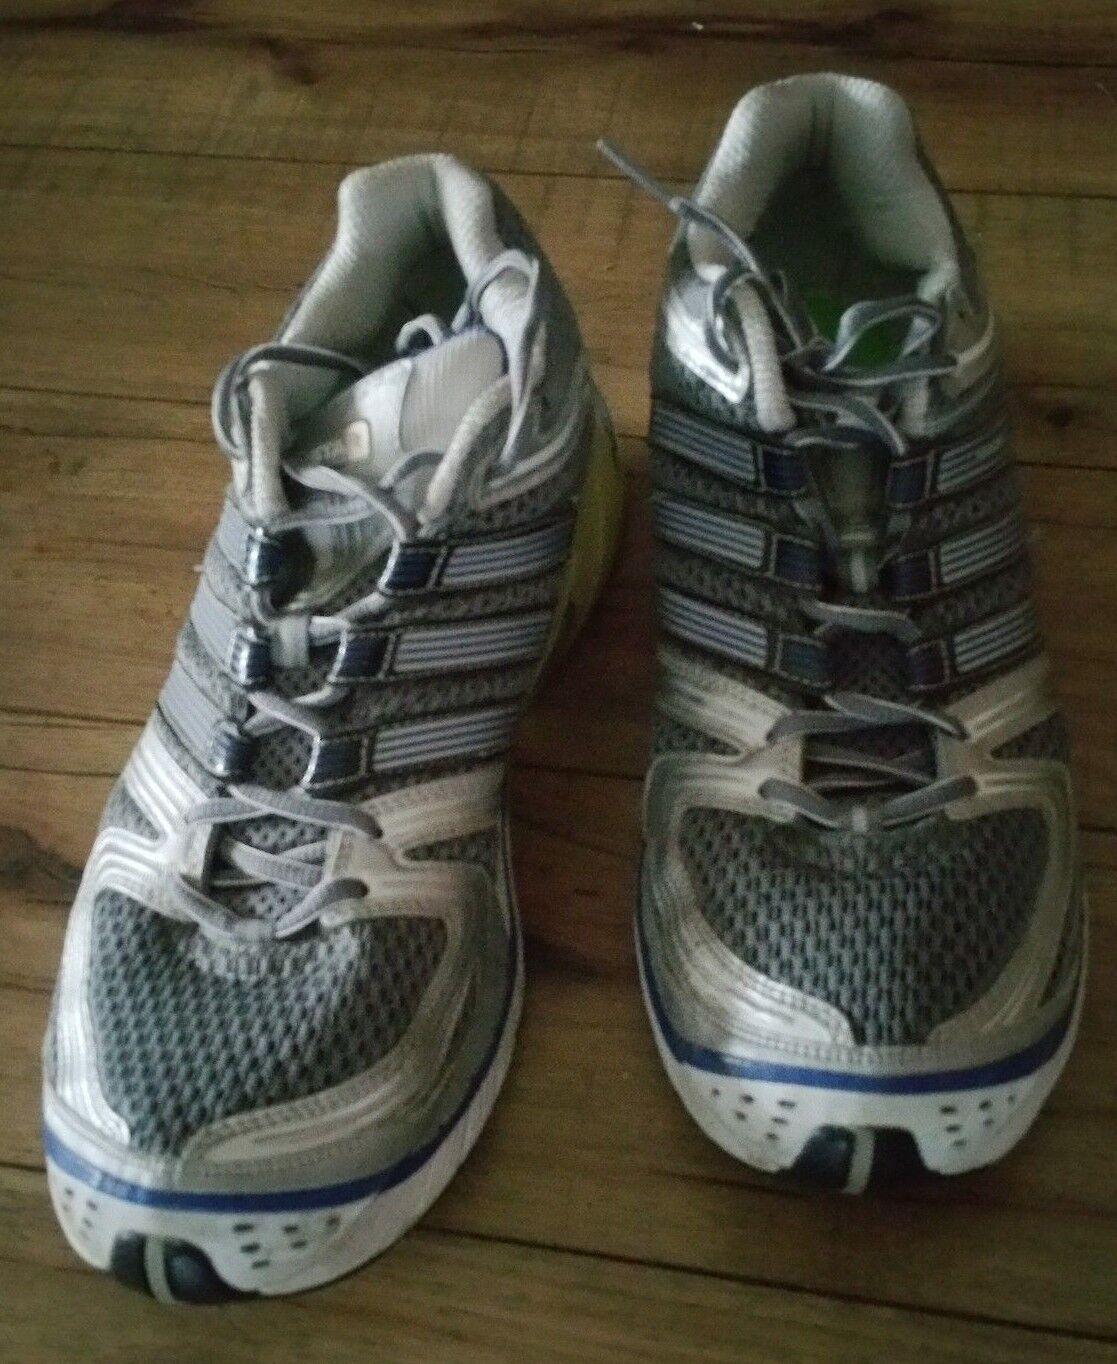 Adidas sneaker calzado deportivo de alto rendimiento / sneaker Adidas Hombre último 4d6852